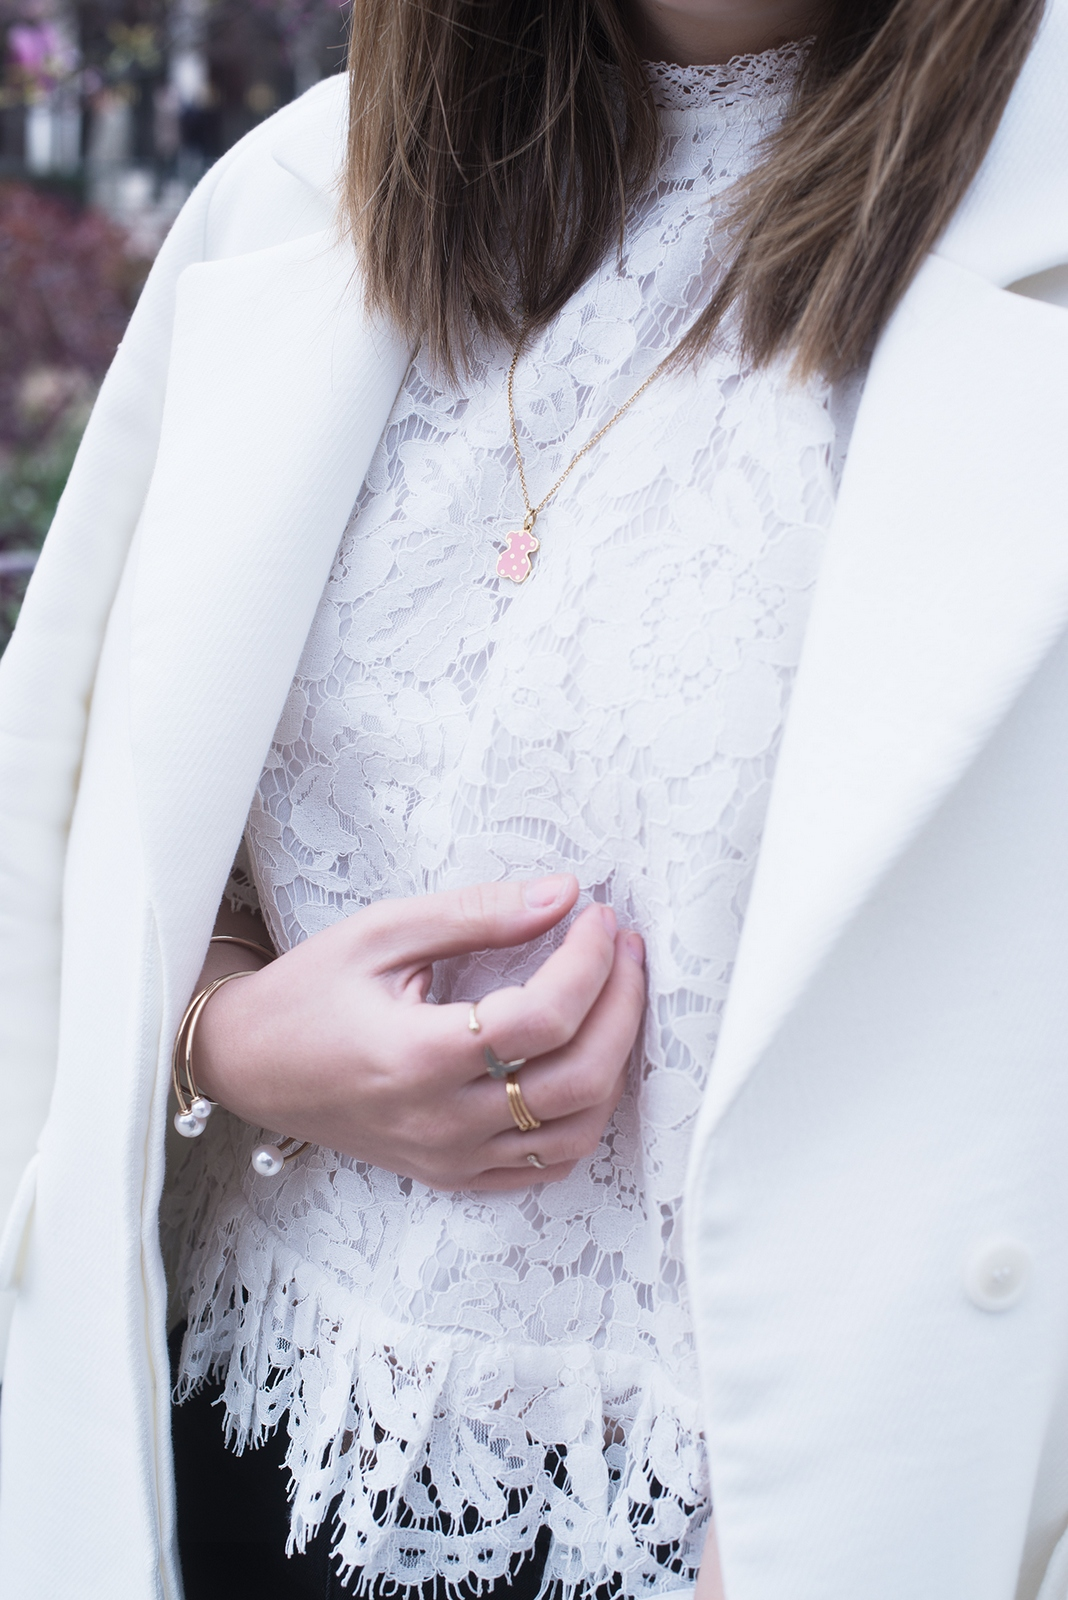 Blog mode femme Paris - Du style, Madame - streetstyle - top dentelle blanc - tous jewellery